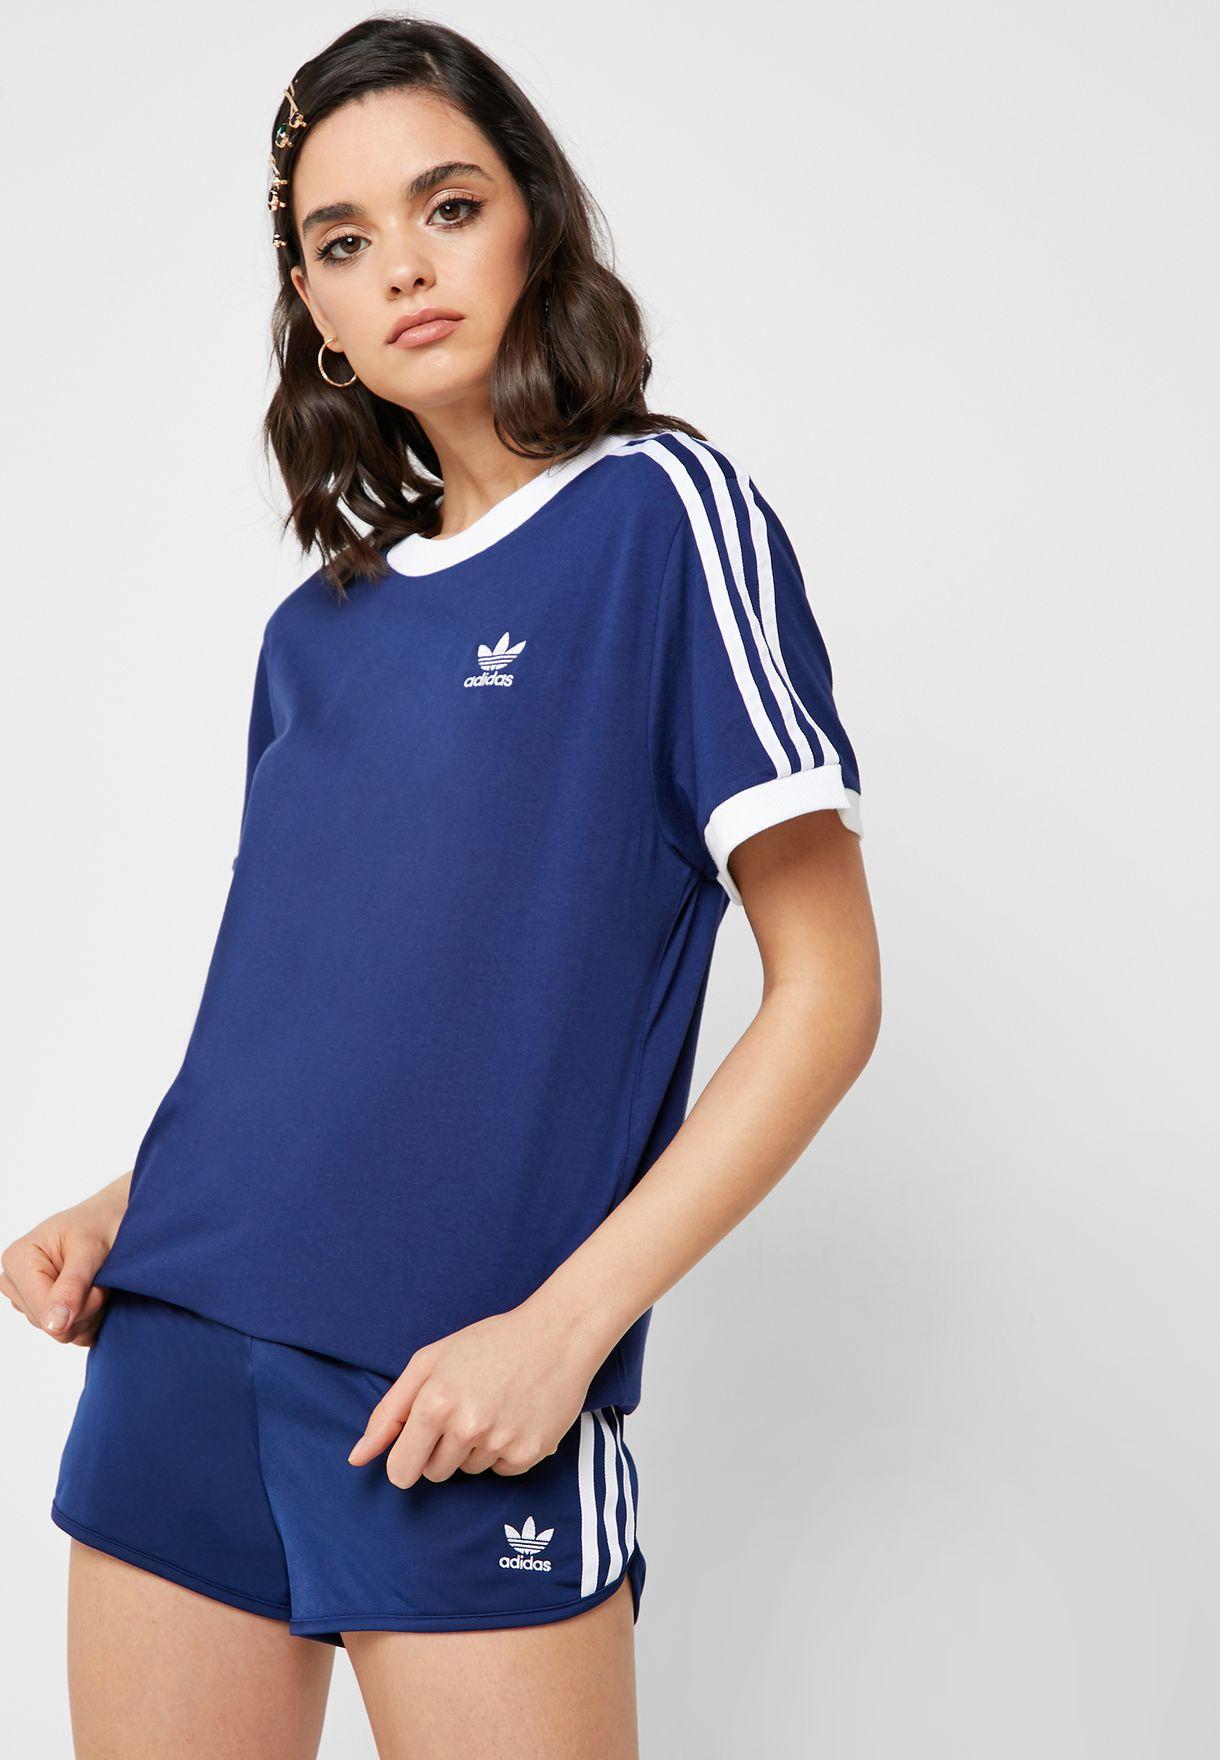 2c6b11ee Shop adidas Originals navy 3 Stripes T-Shirt DV2592 for Women in ...